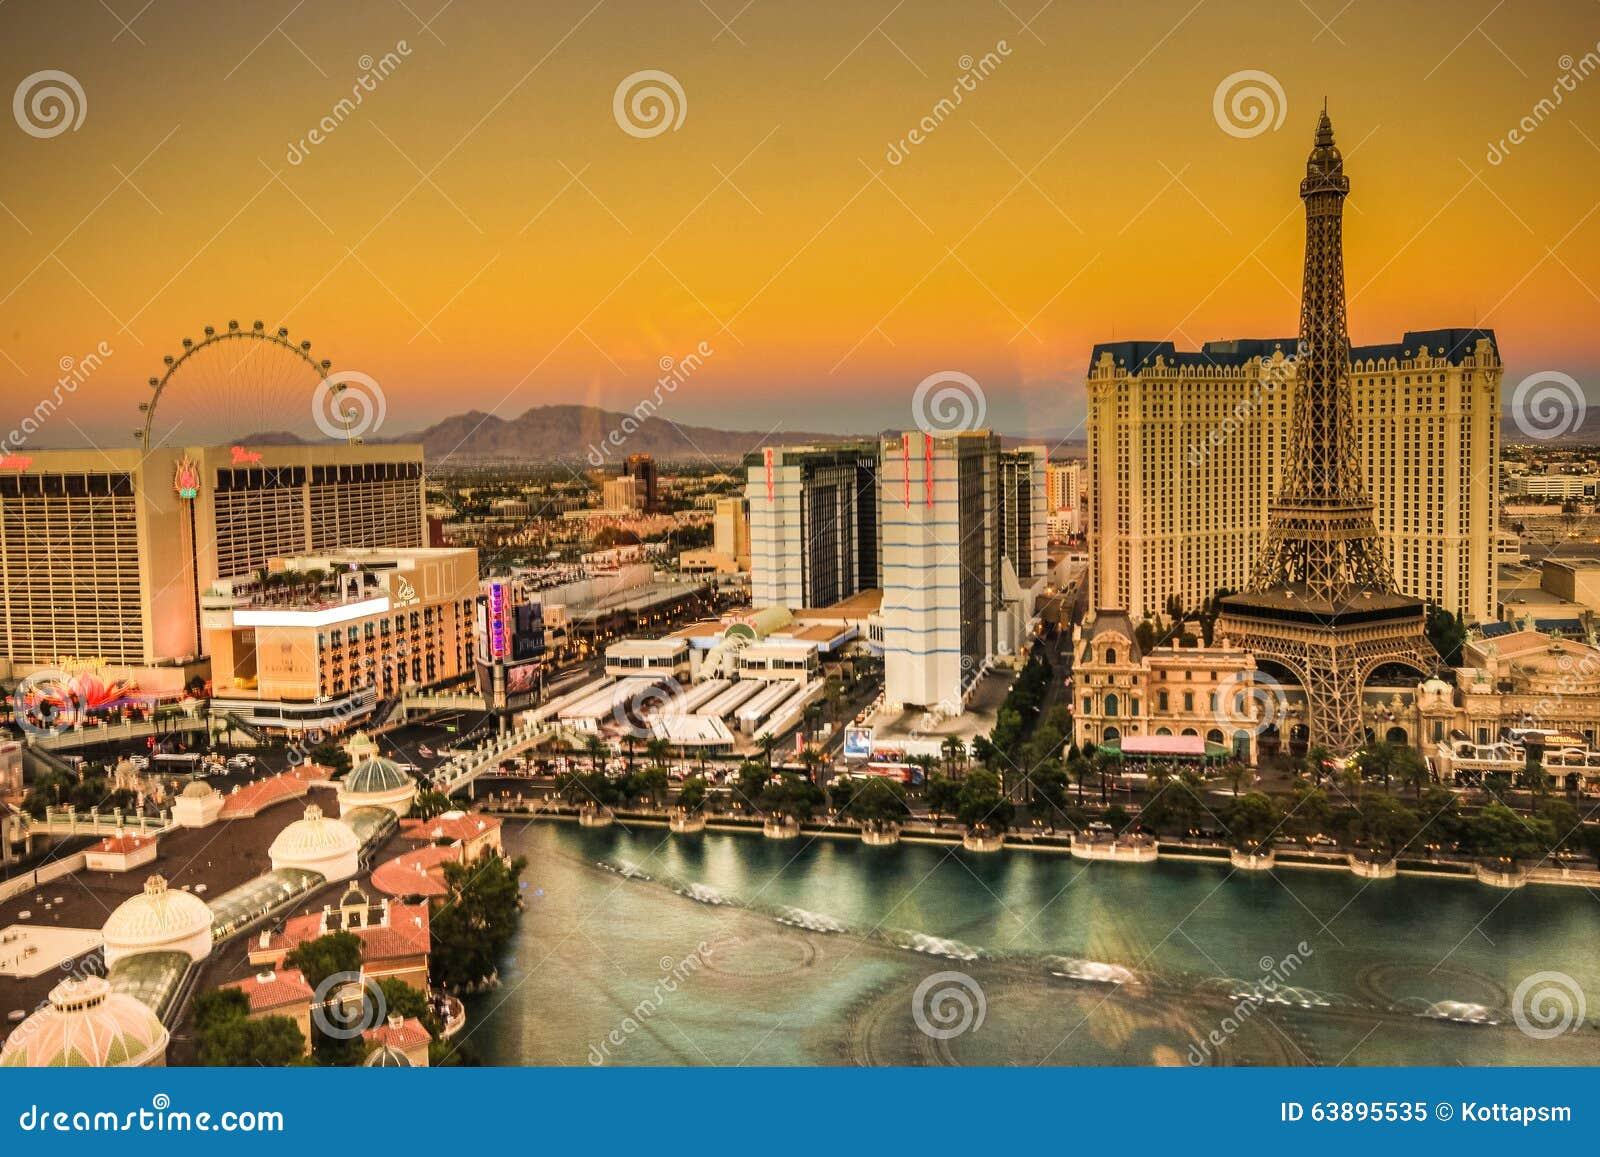 Birds view of Las Vegas Strip at twilght